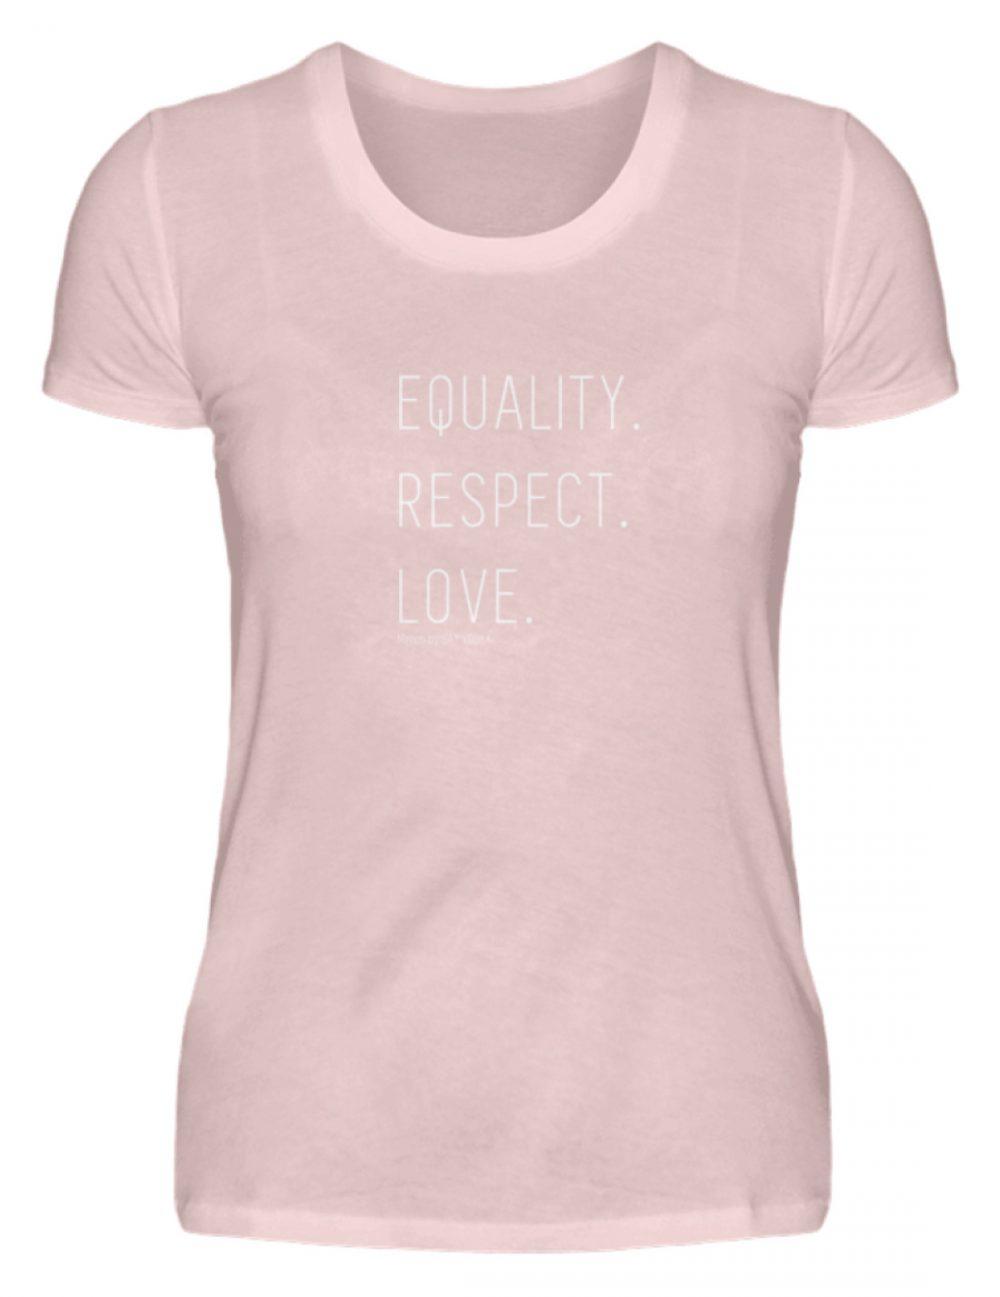 EQUALITY. RESPECT. LOVE. - Damen Premiumshirt-5949